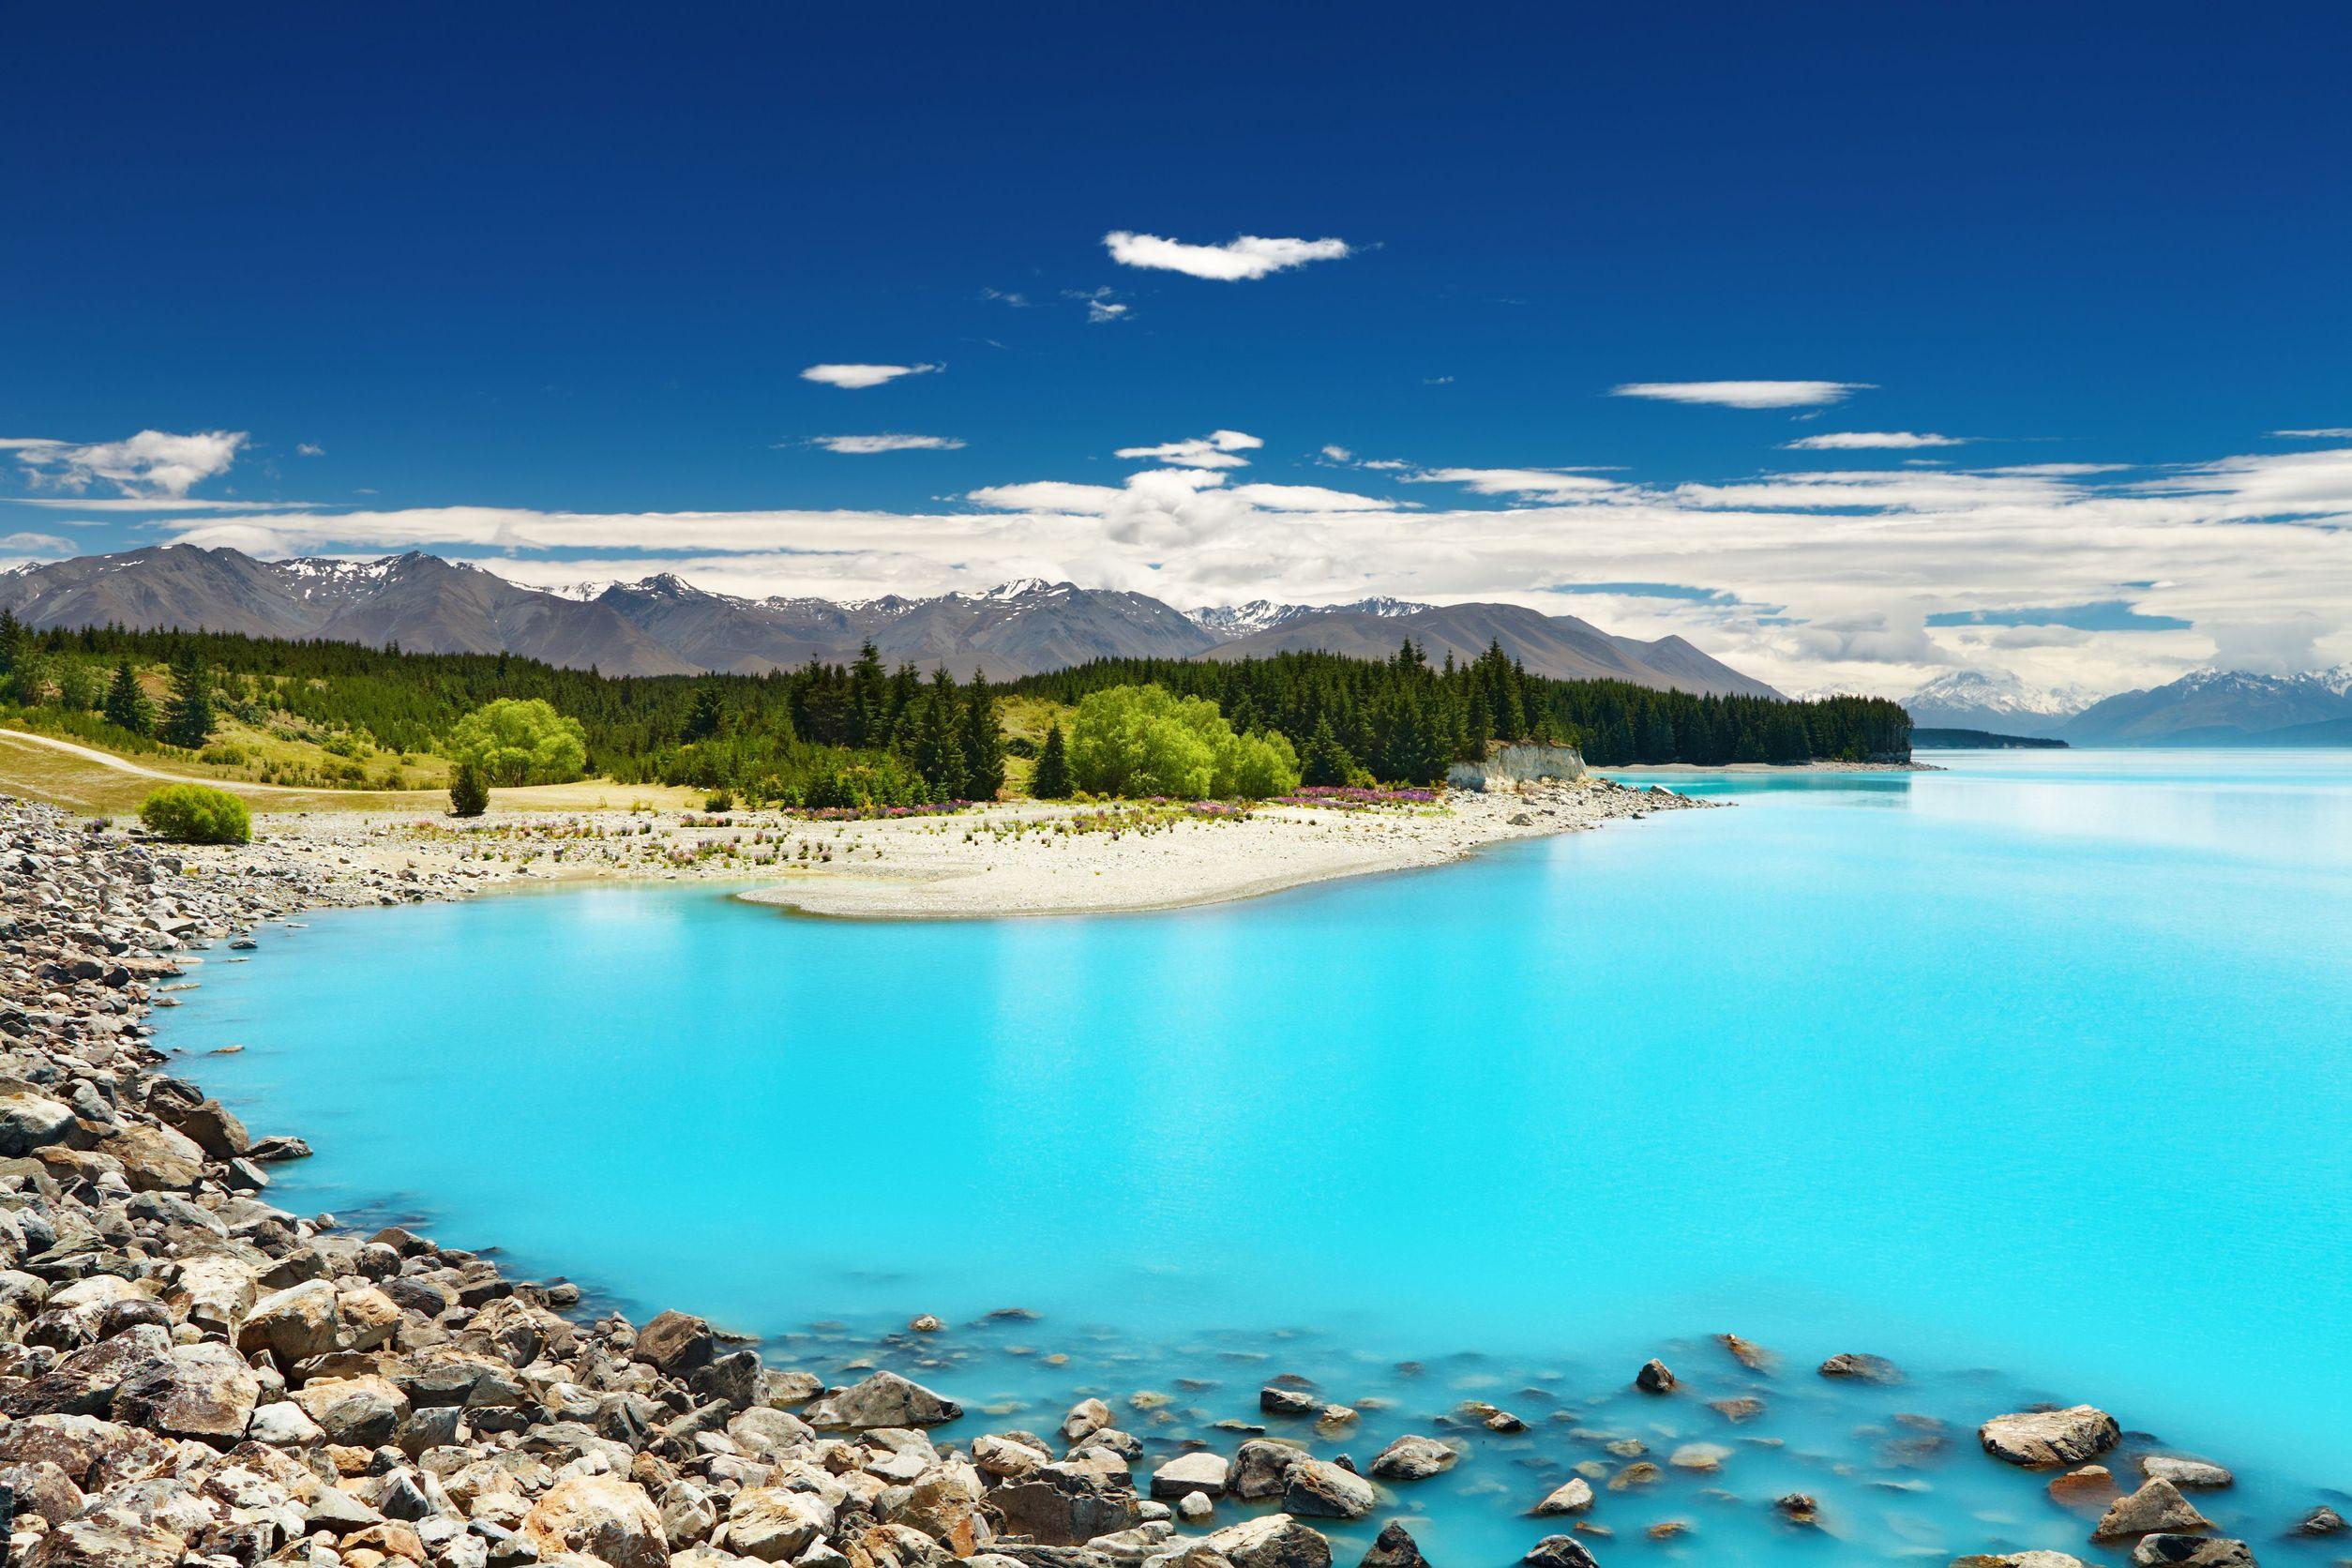 new zealand pure blue lake 123rf